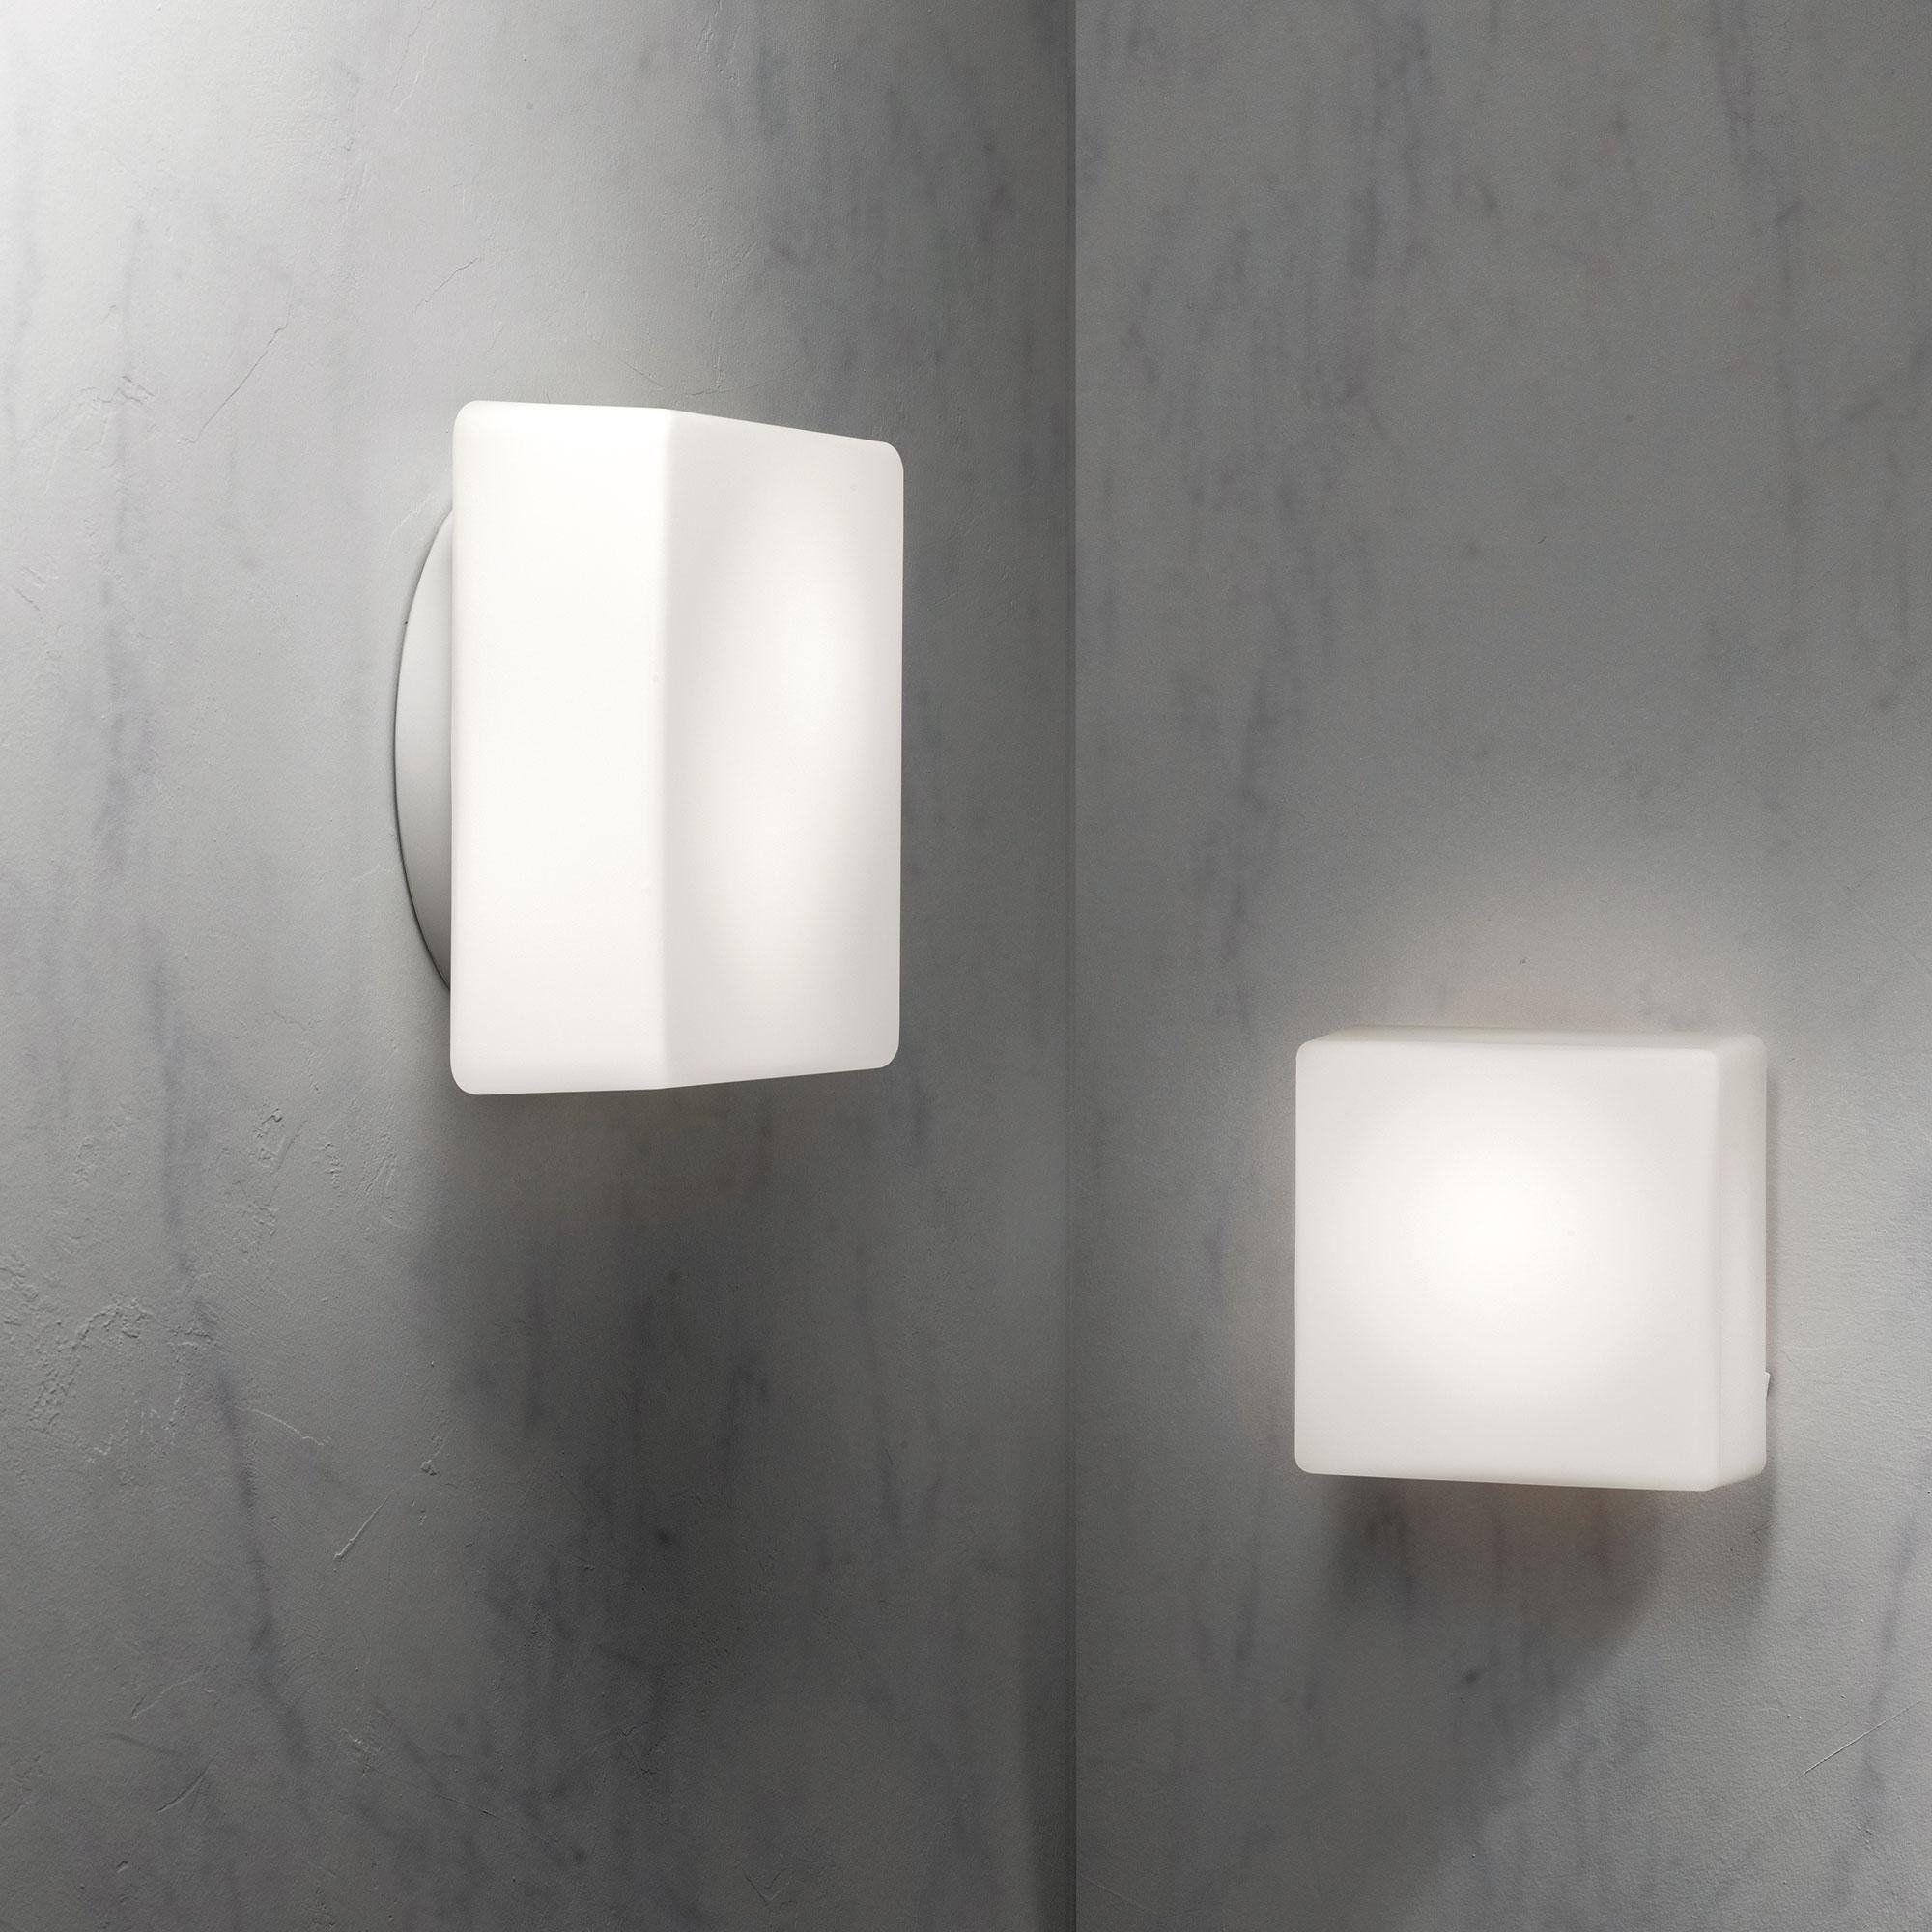 nemo quadra applique murale plafonnier ambientedirect. Black Bedroom Furniture Sets. Home Design Ideas